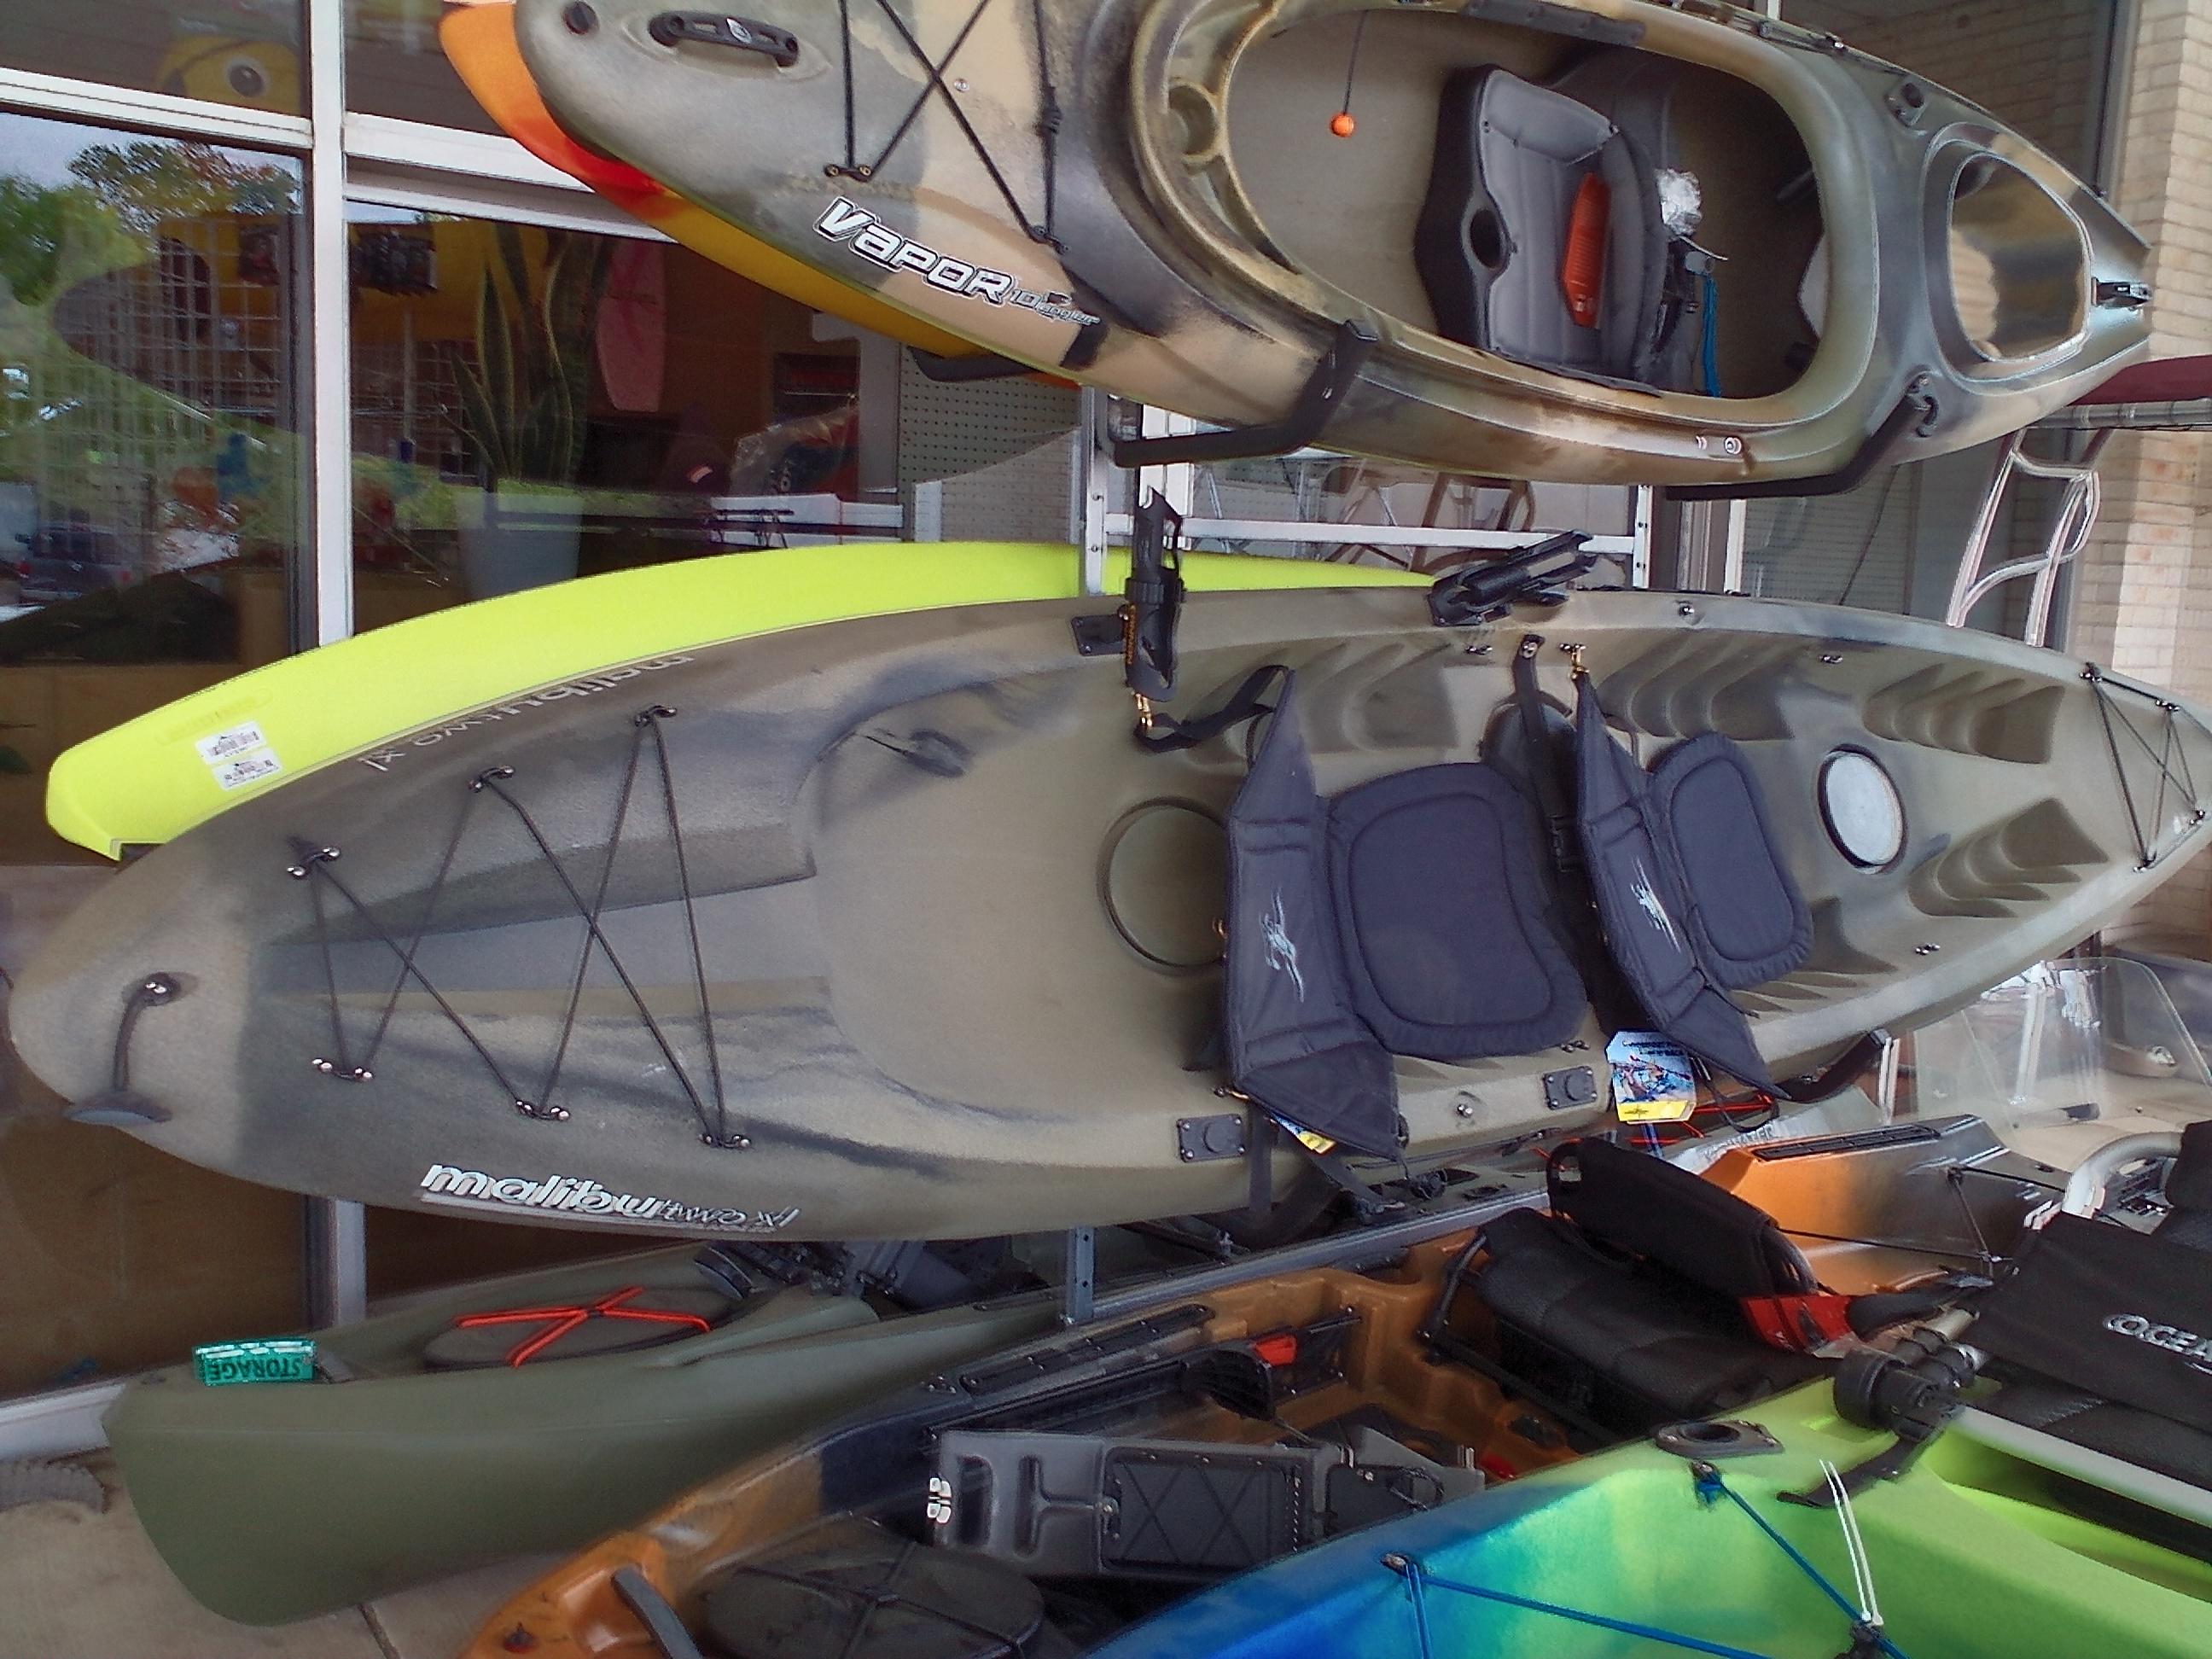 2021 Ocean Kayak boat for sale, model of the boat is Malibu 2 XL ANGLER & Image # 2 of 2